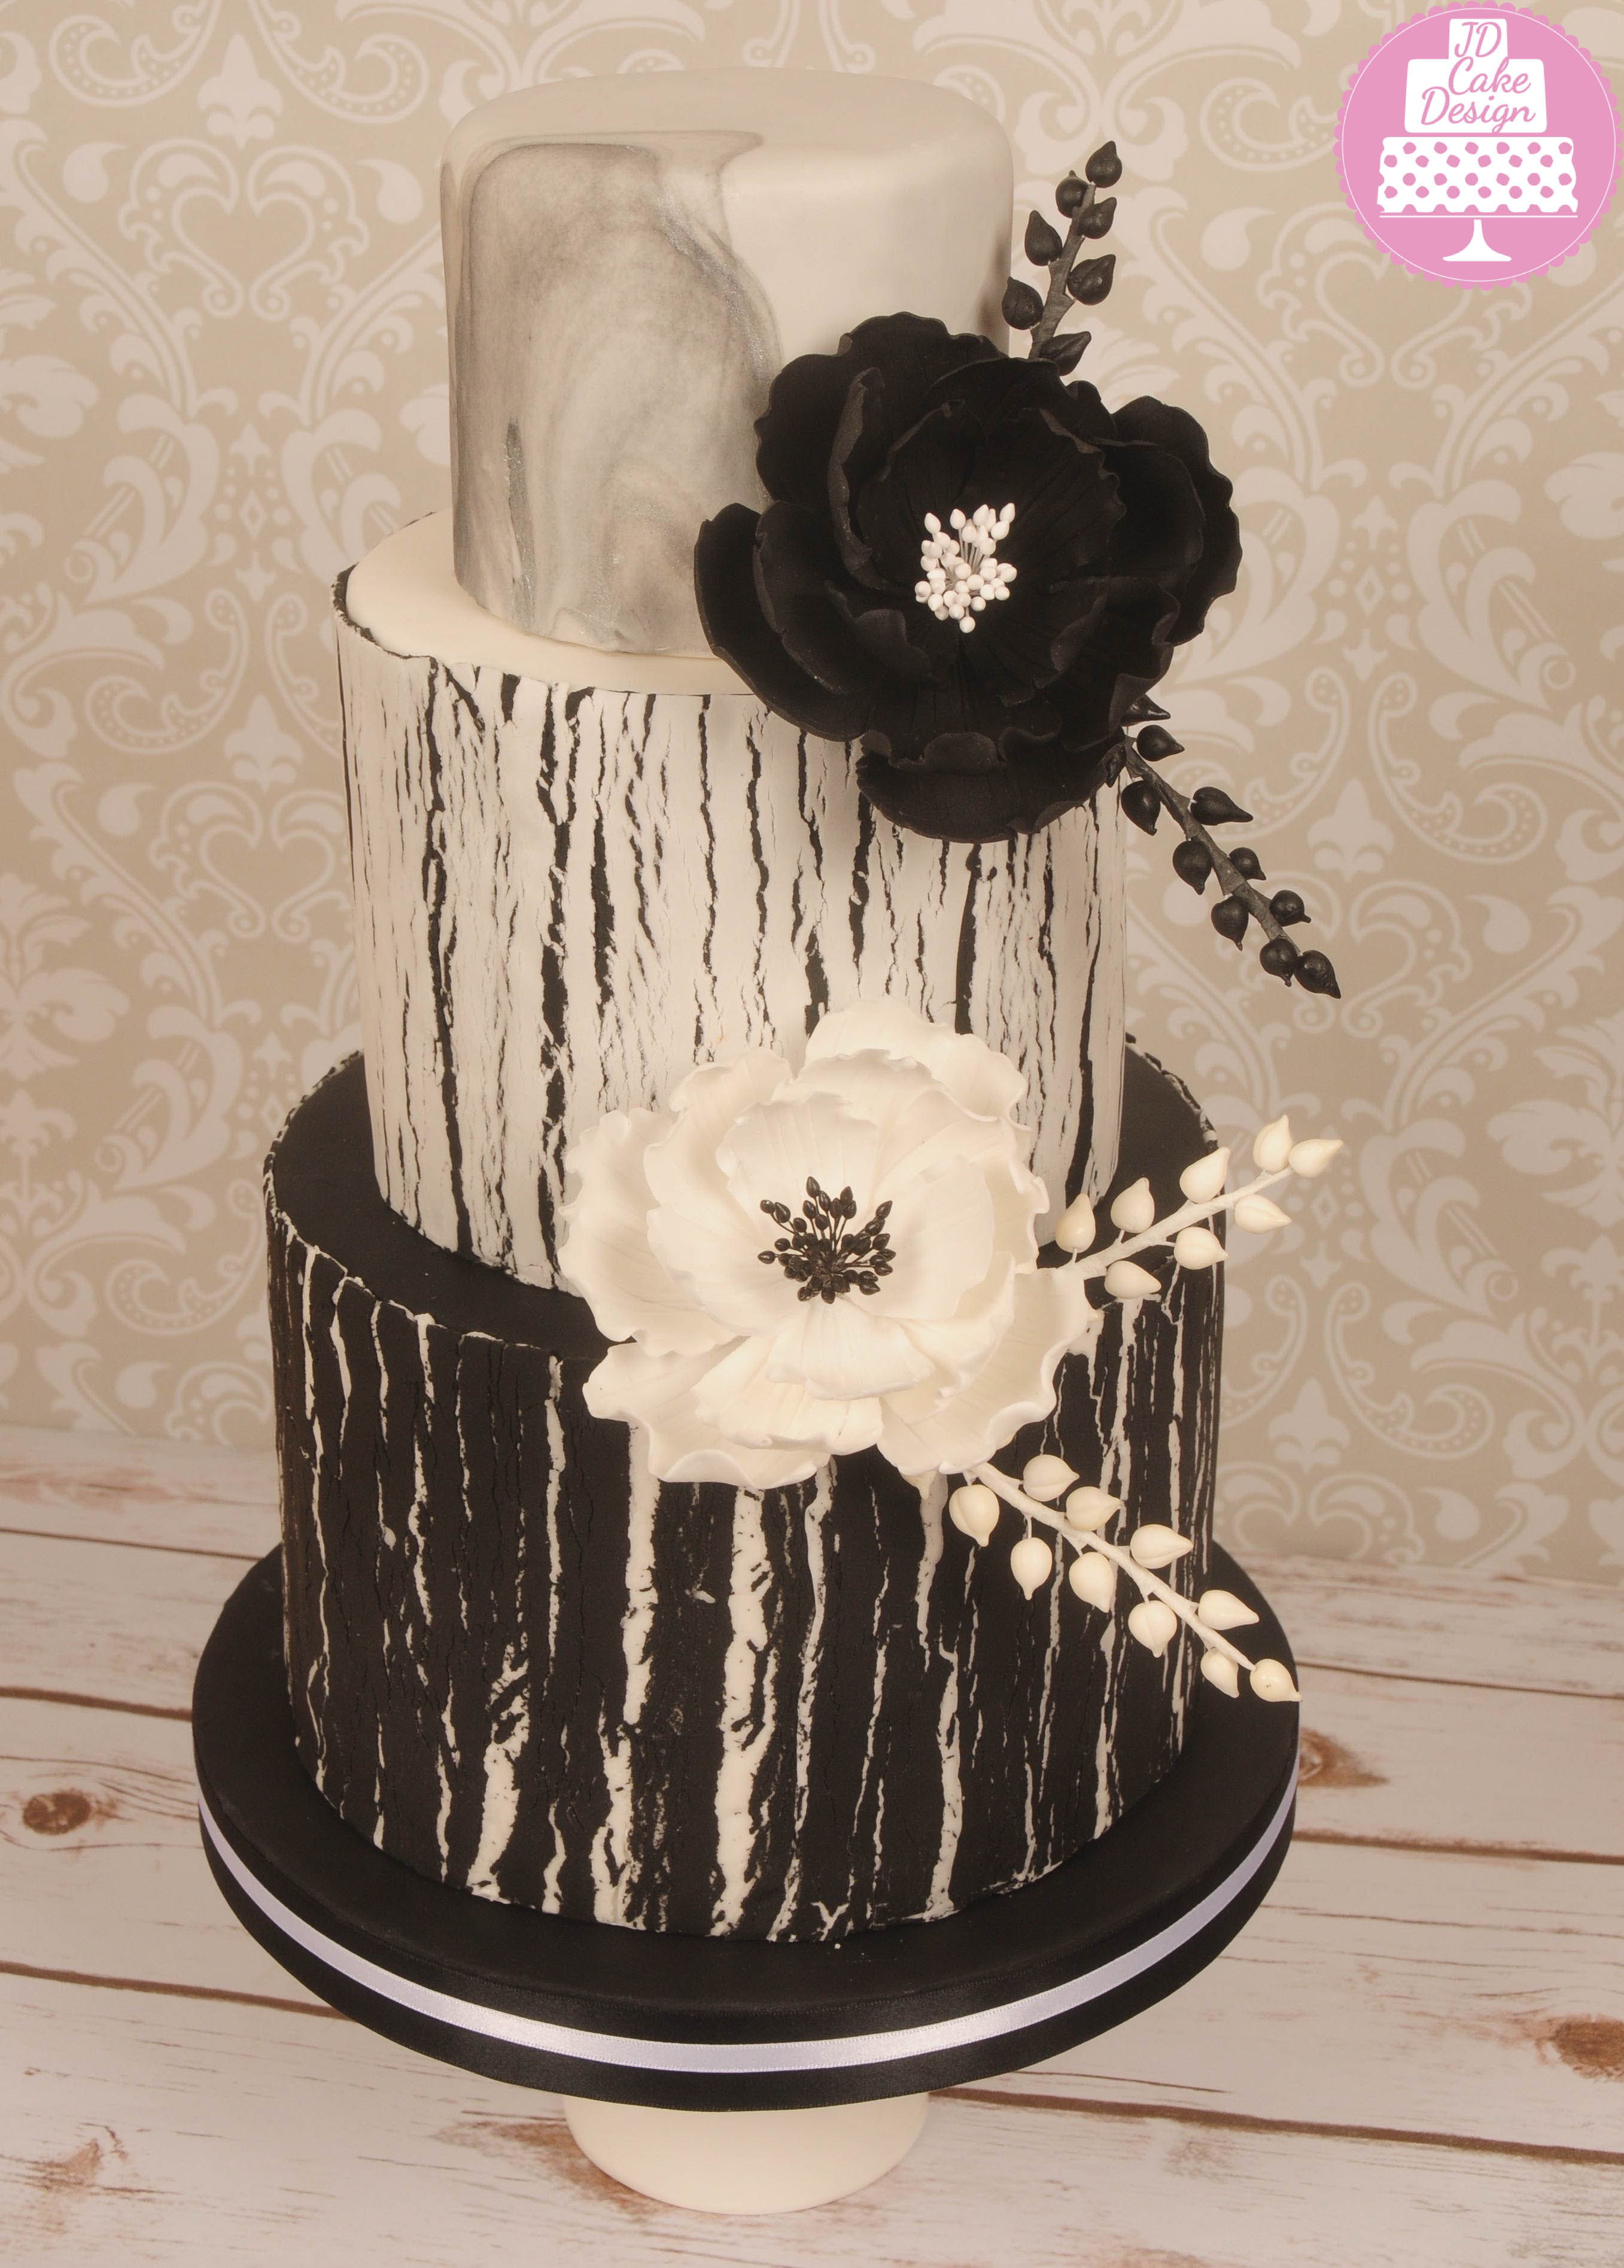 Black and white bark effect wedding cake